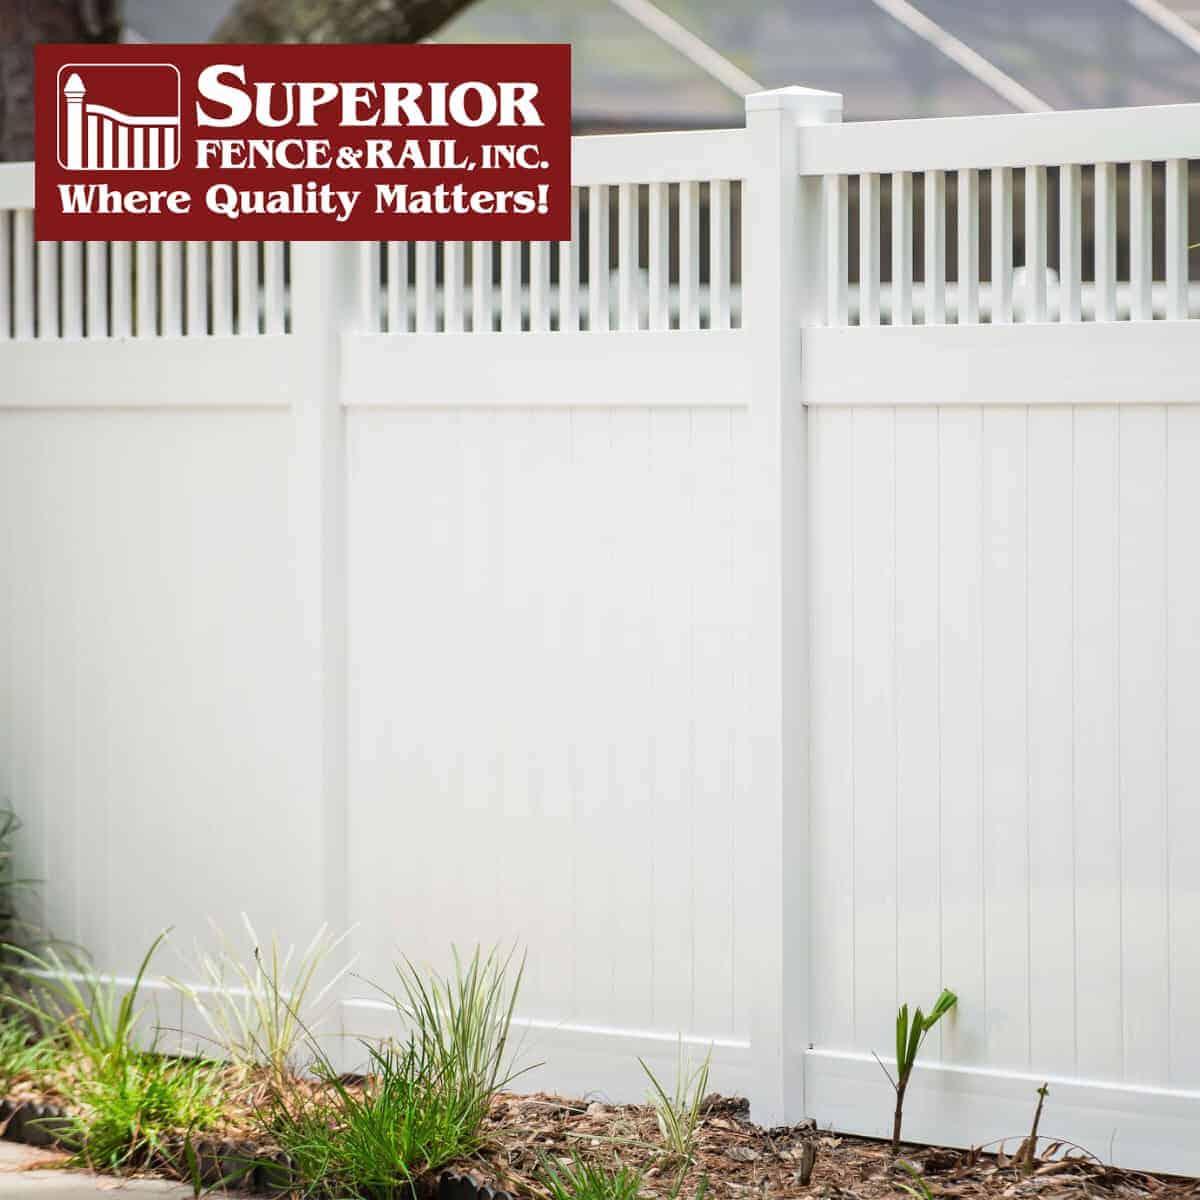 Powhatan County fence company contractor